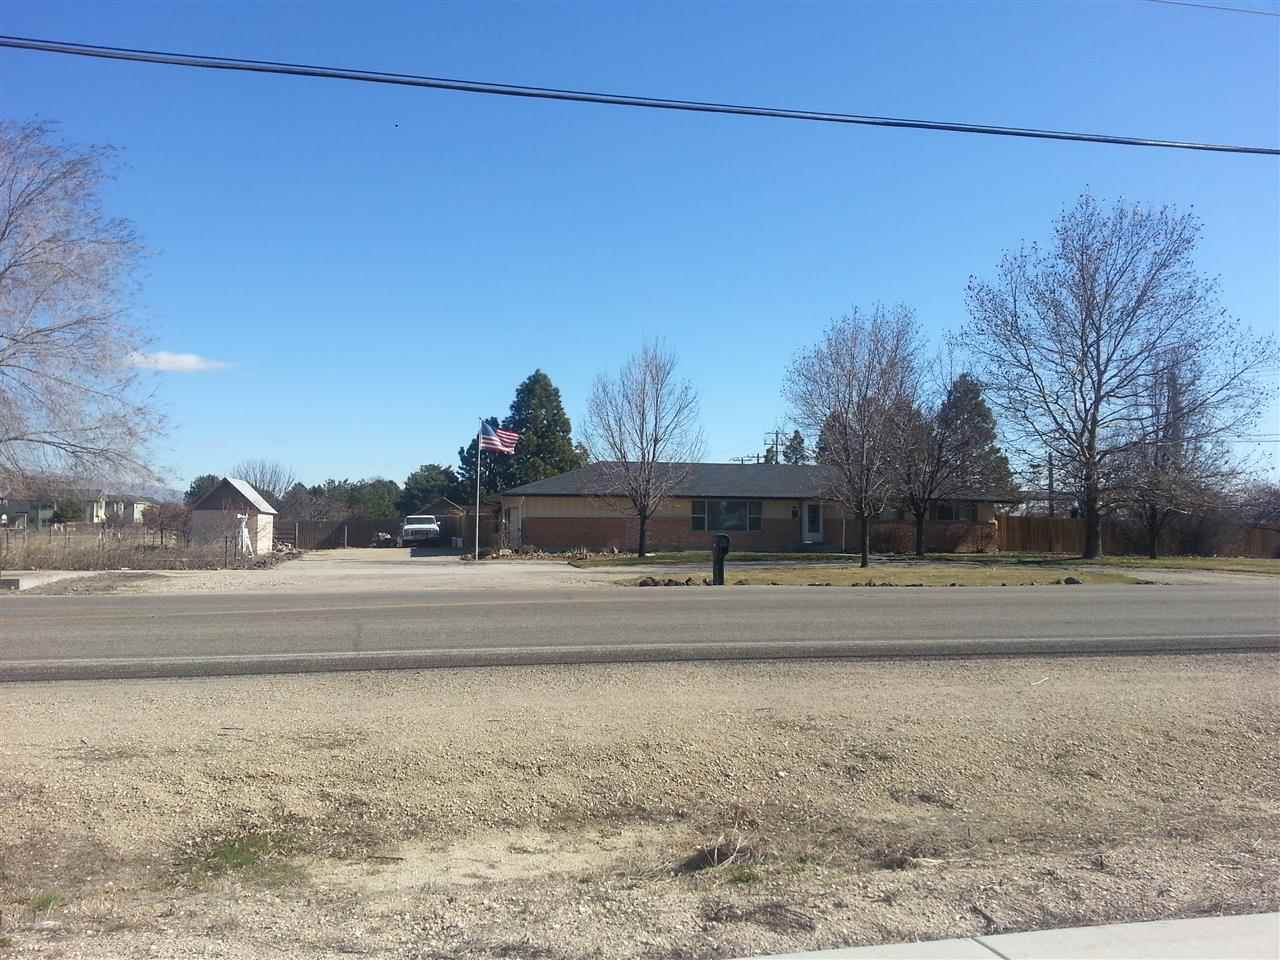 6190 S Five Mile Road, Boise, ID, 83709 Primary Photo